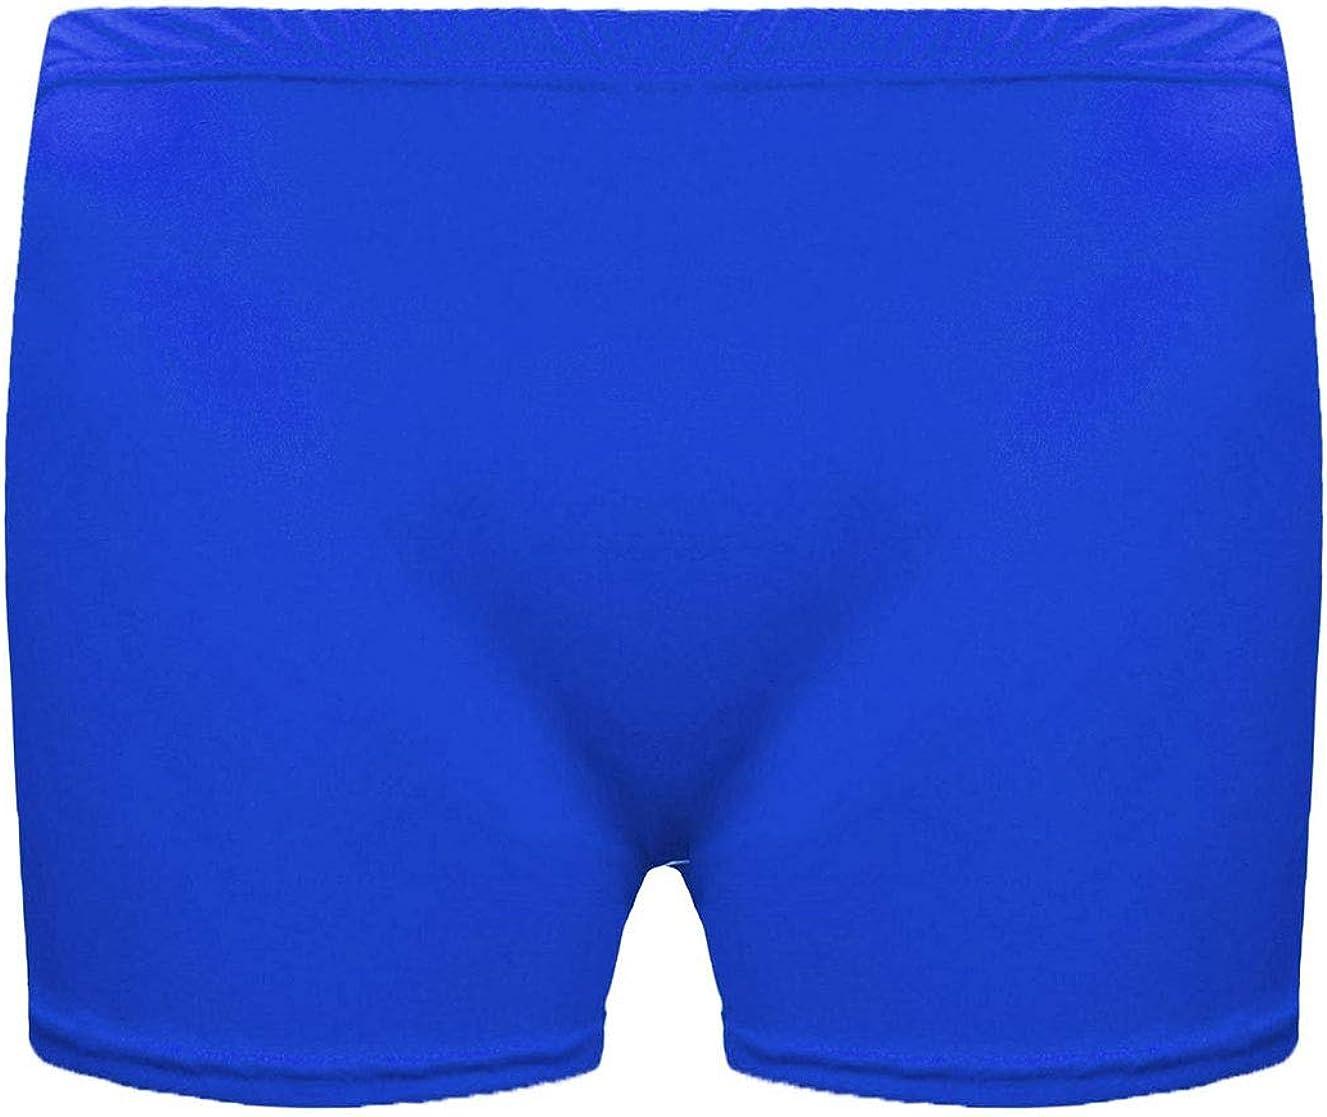 21Fashion Womens Girls Microfiber Hot Pants Shorts Ladies Dance Gym Stretch Shorts